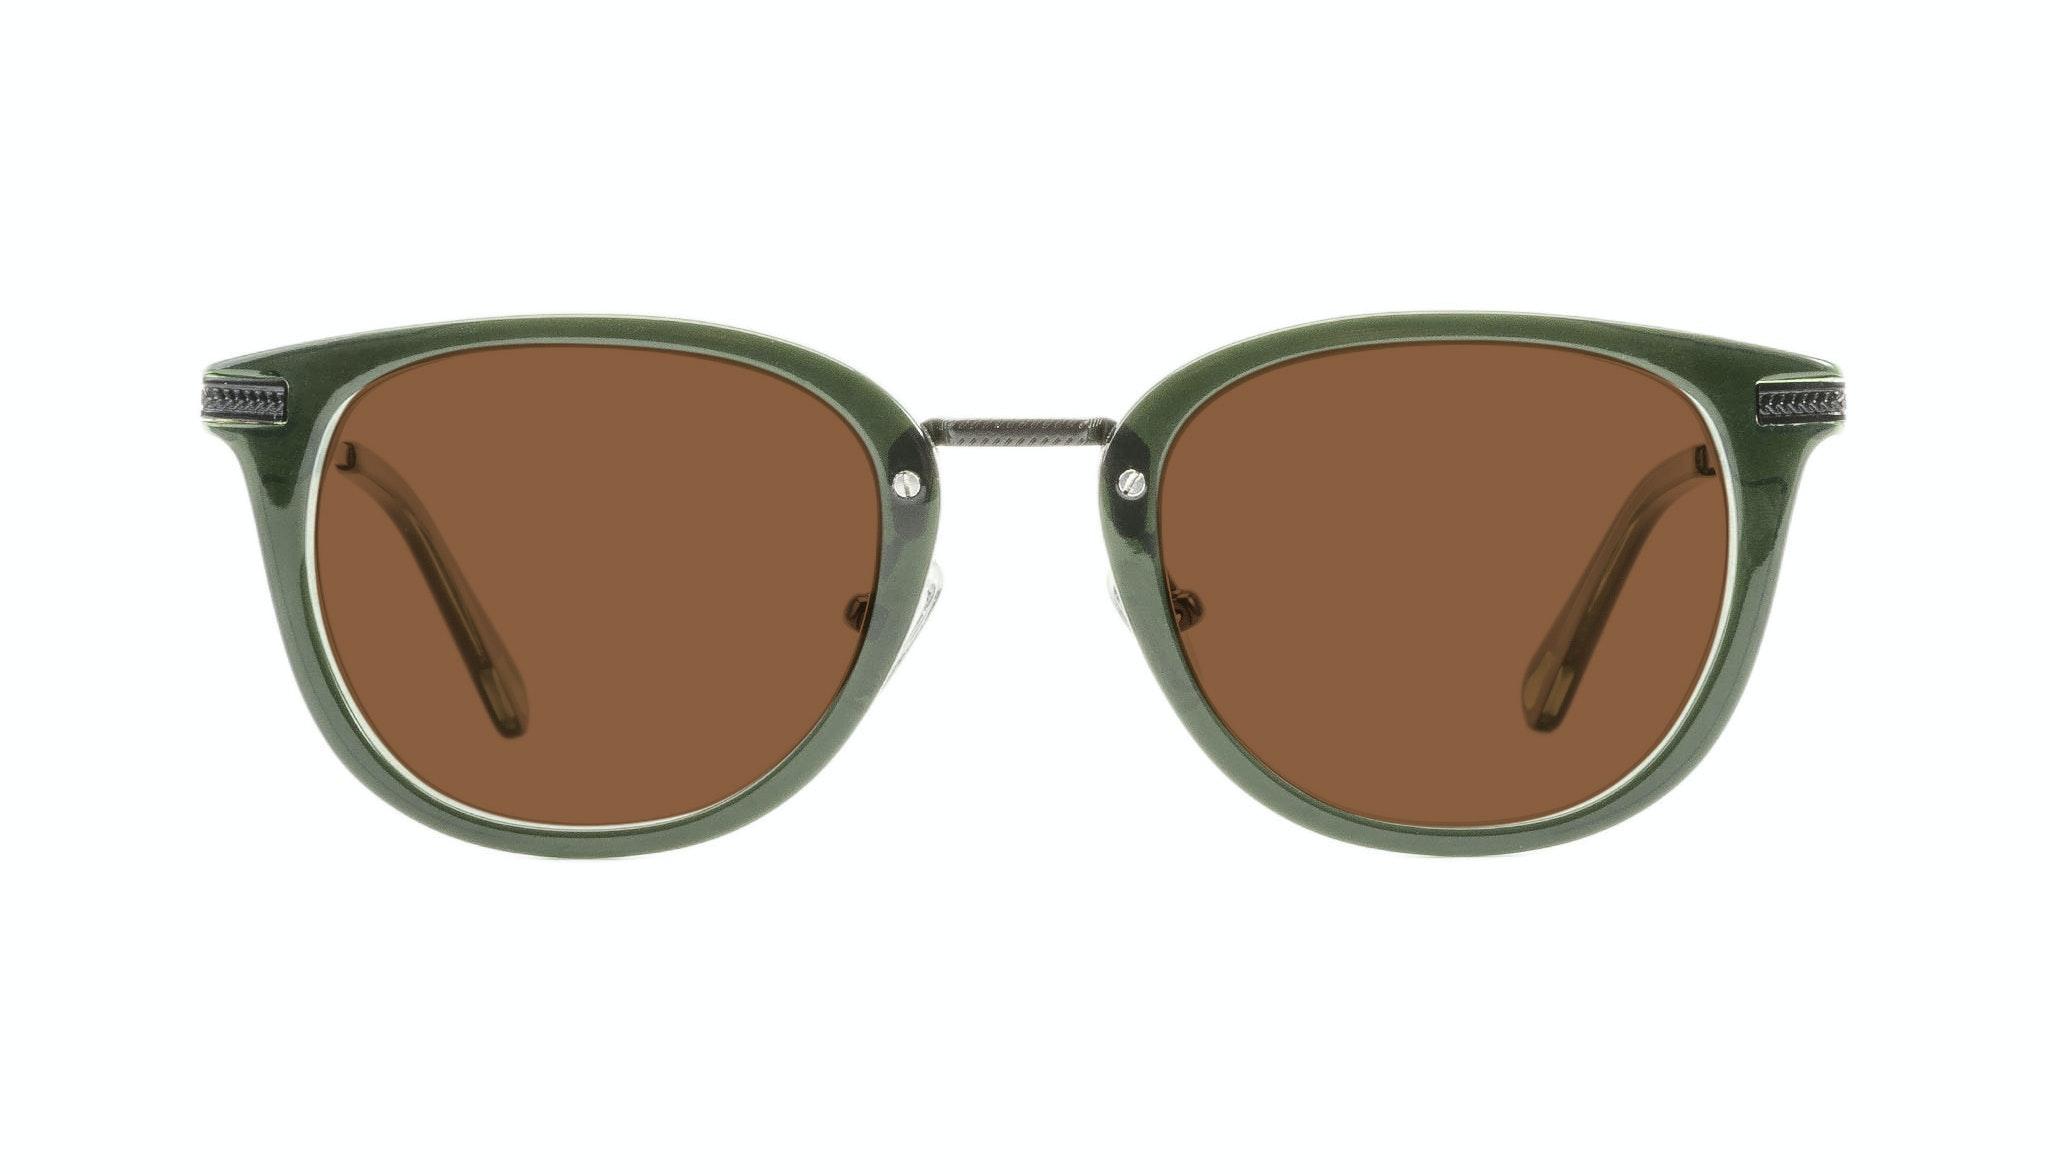 Affordable Fashion Glasses Rectangle Square Sunglasses Men Street Soul Olive